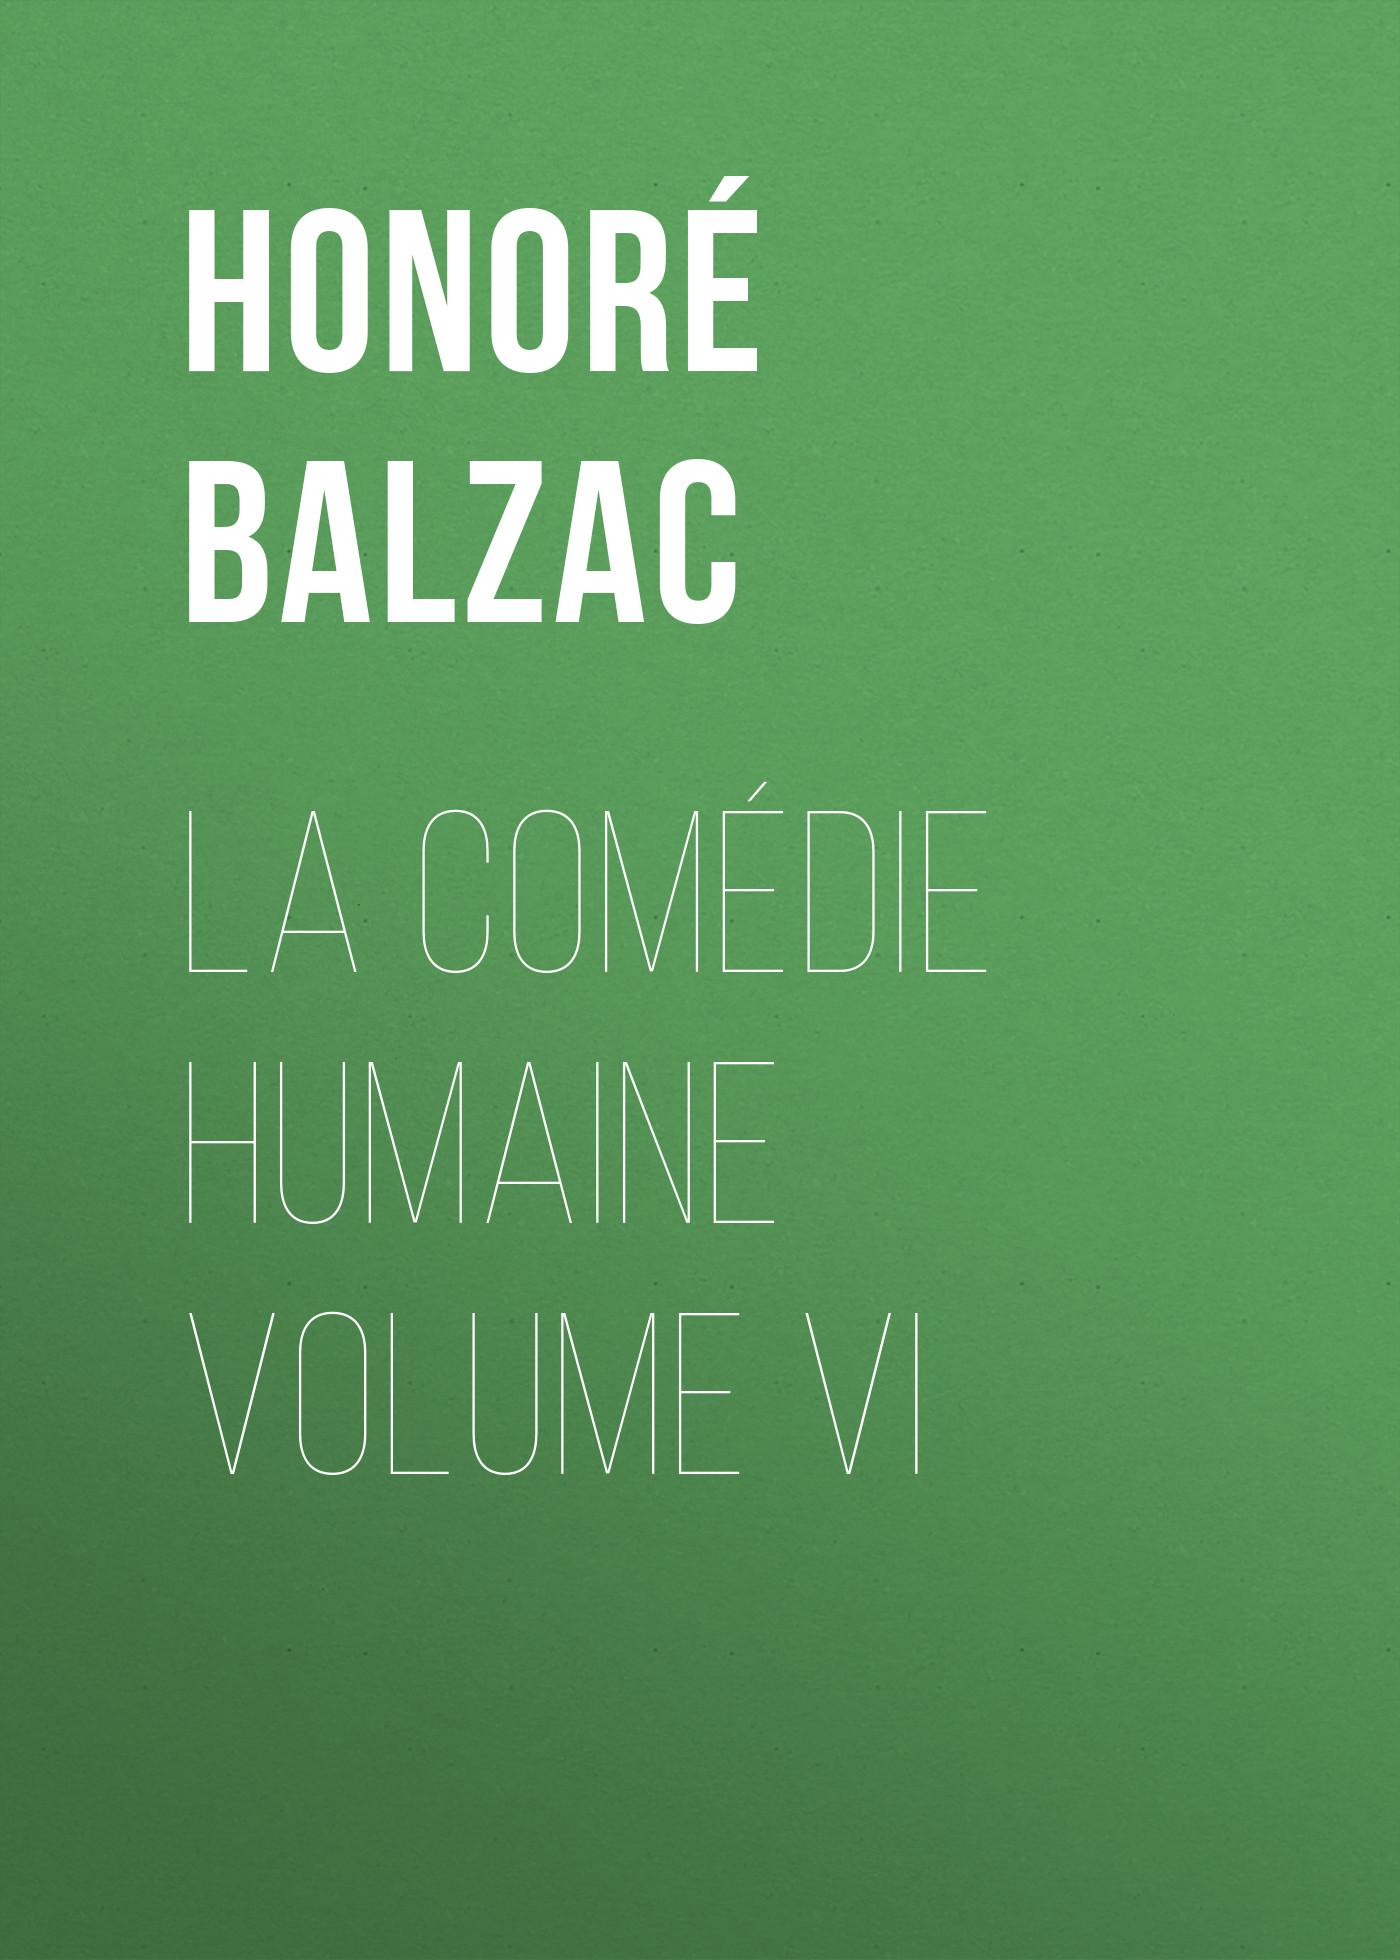 Оноре де Бальзак La Comédie humaine volume VI оноре де бальзак la peau de chagrin